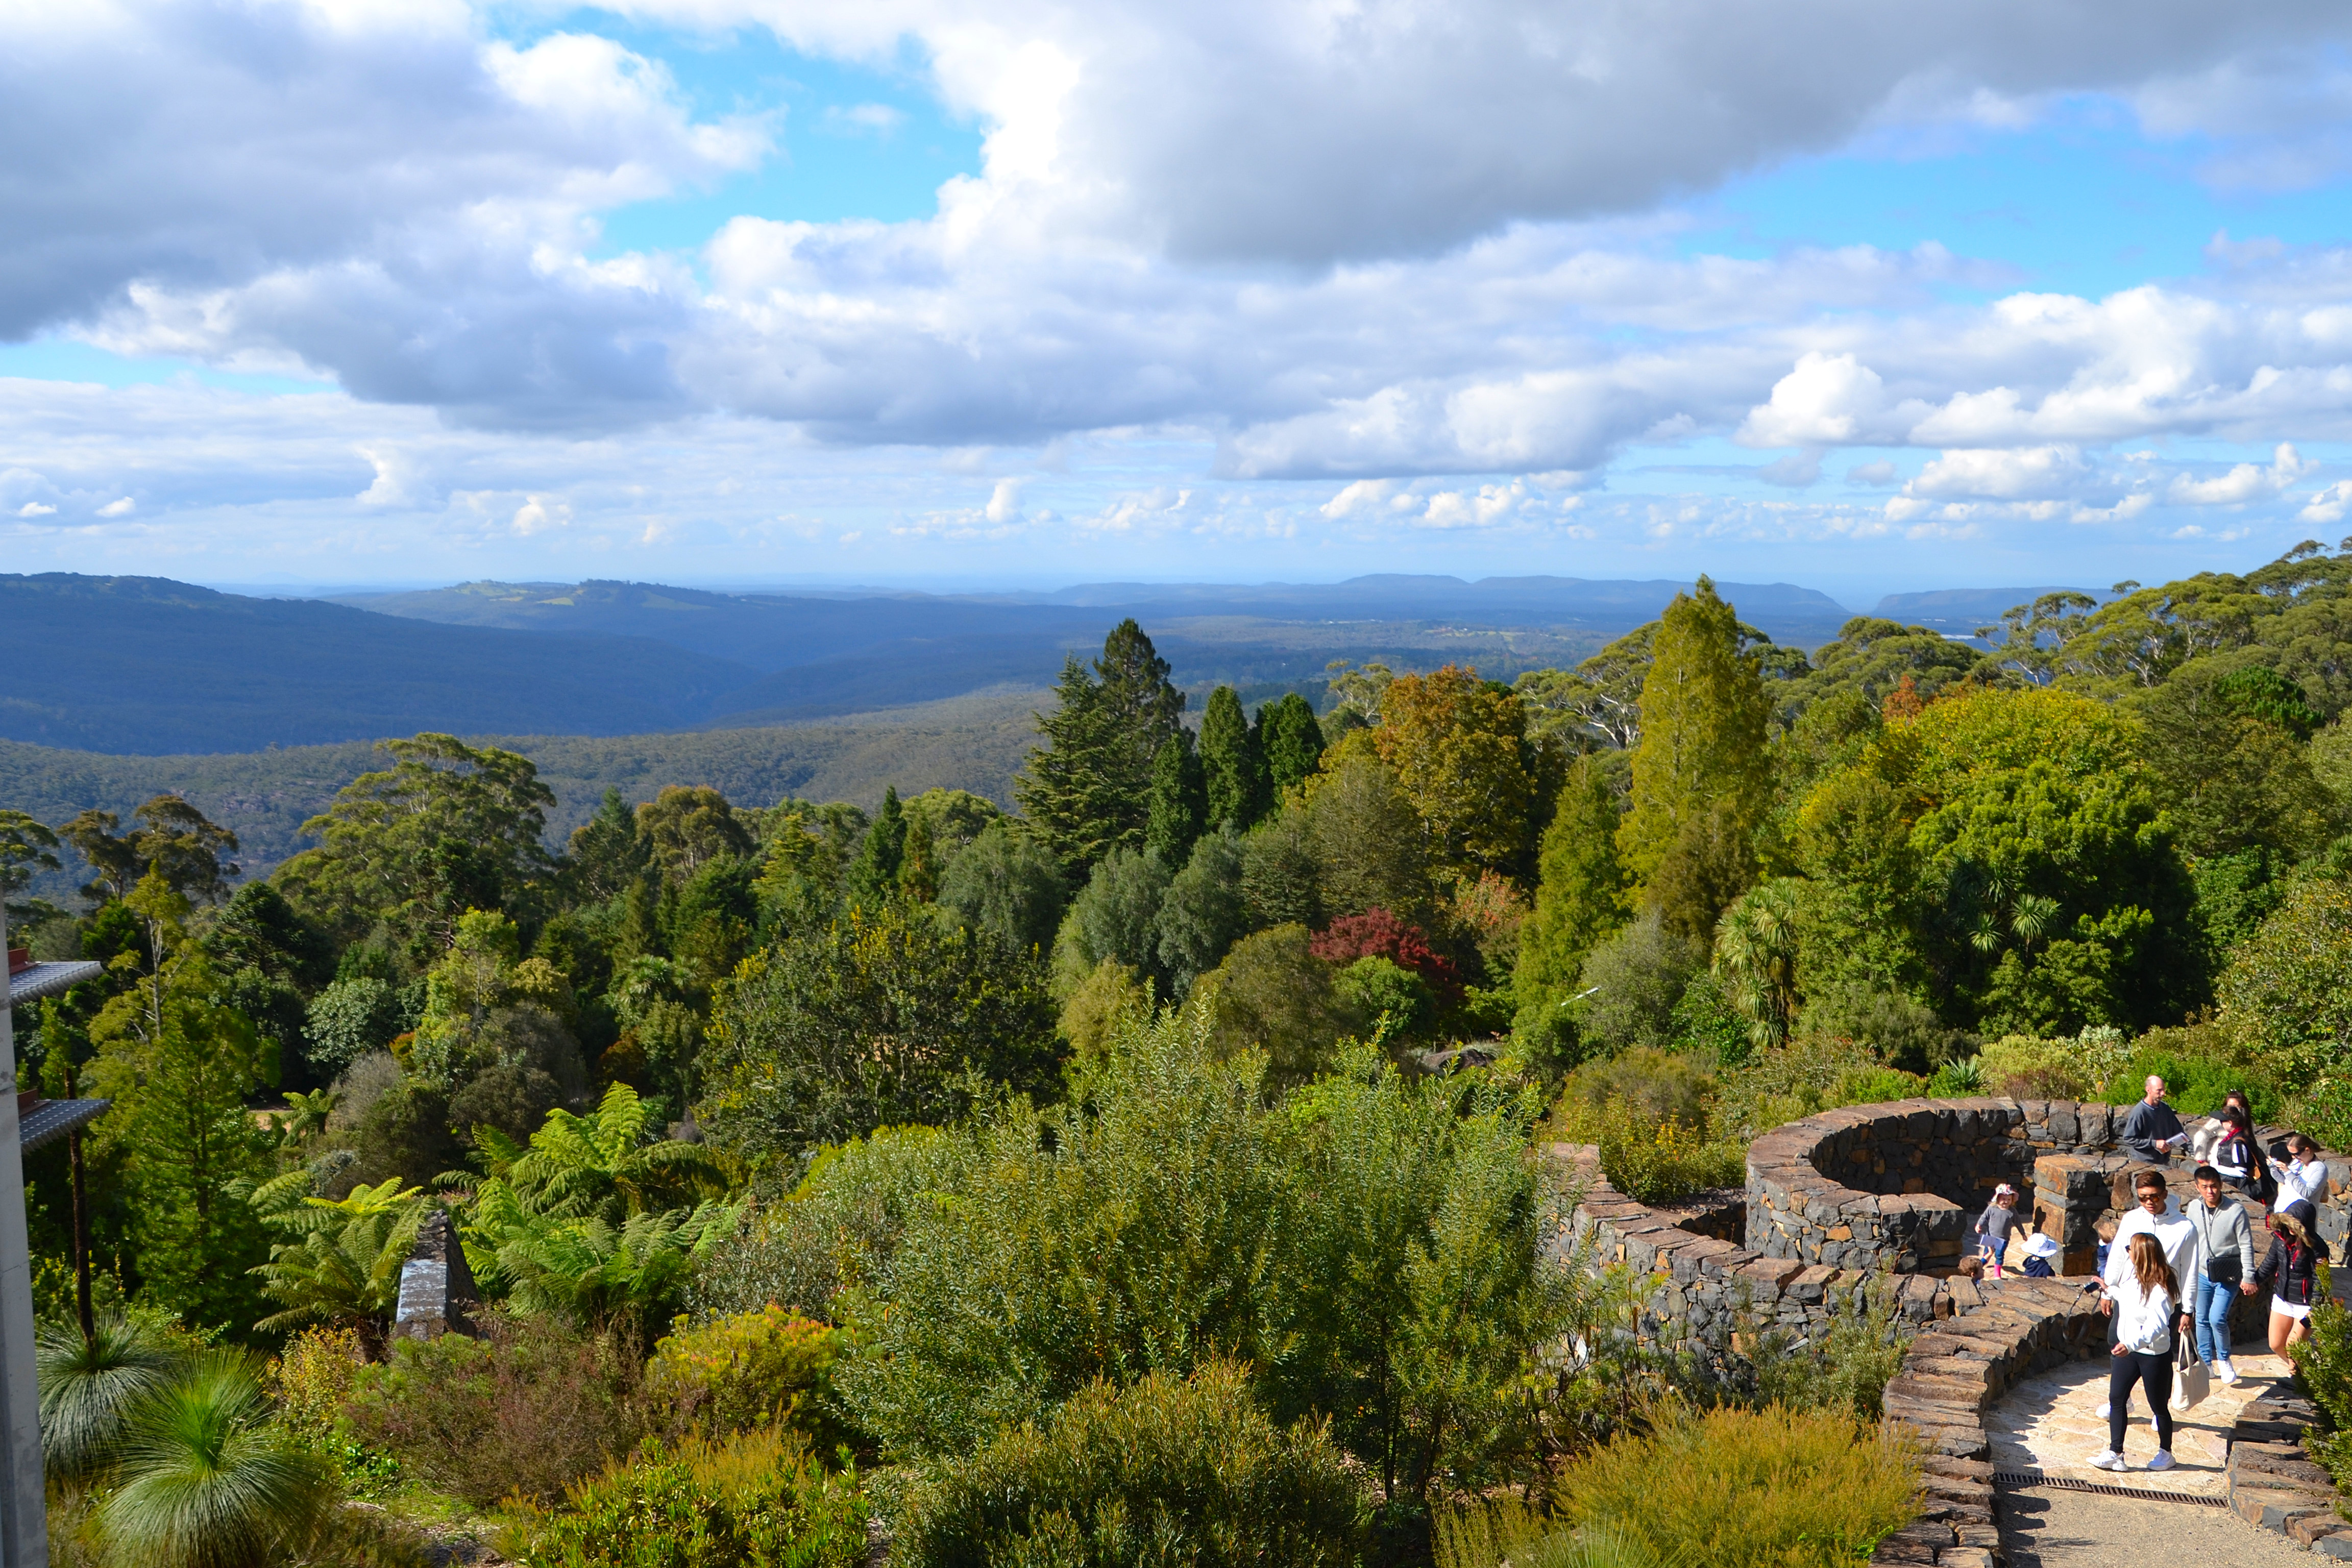 blue_montains_nsw_botanic_garden.JPG